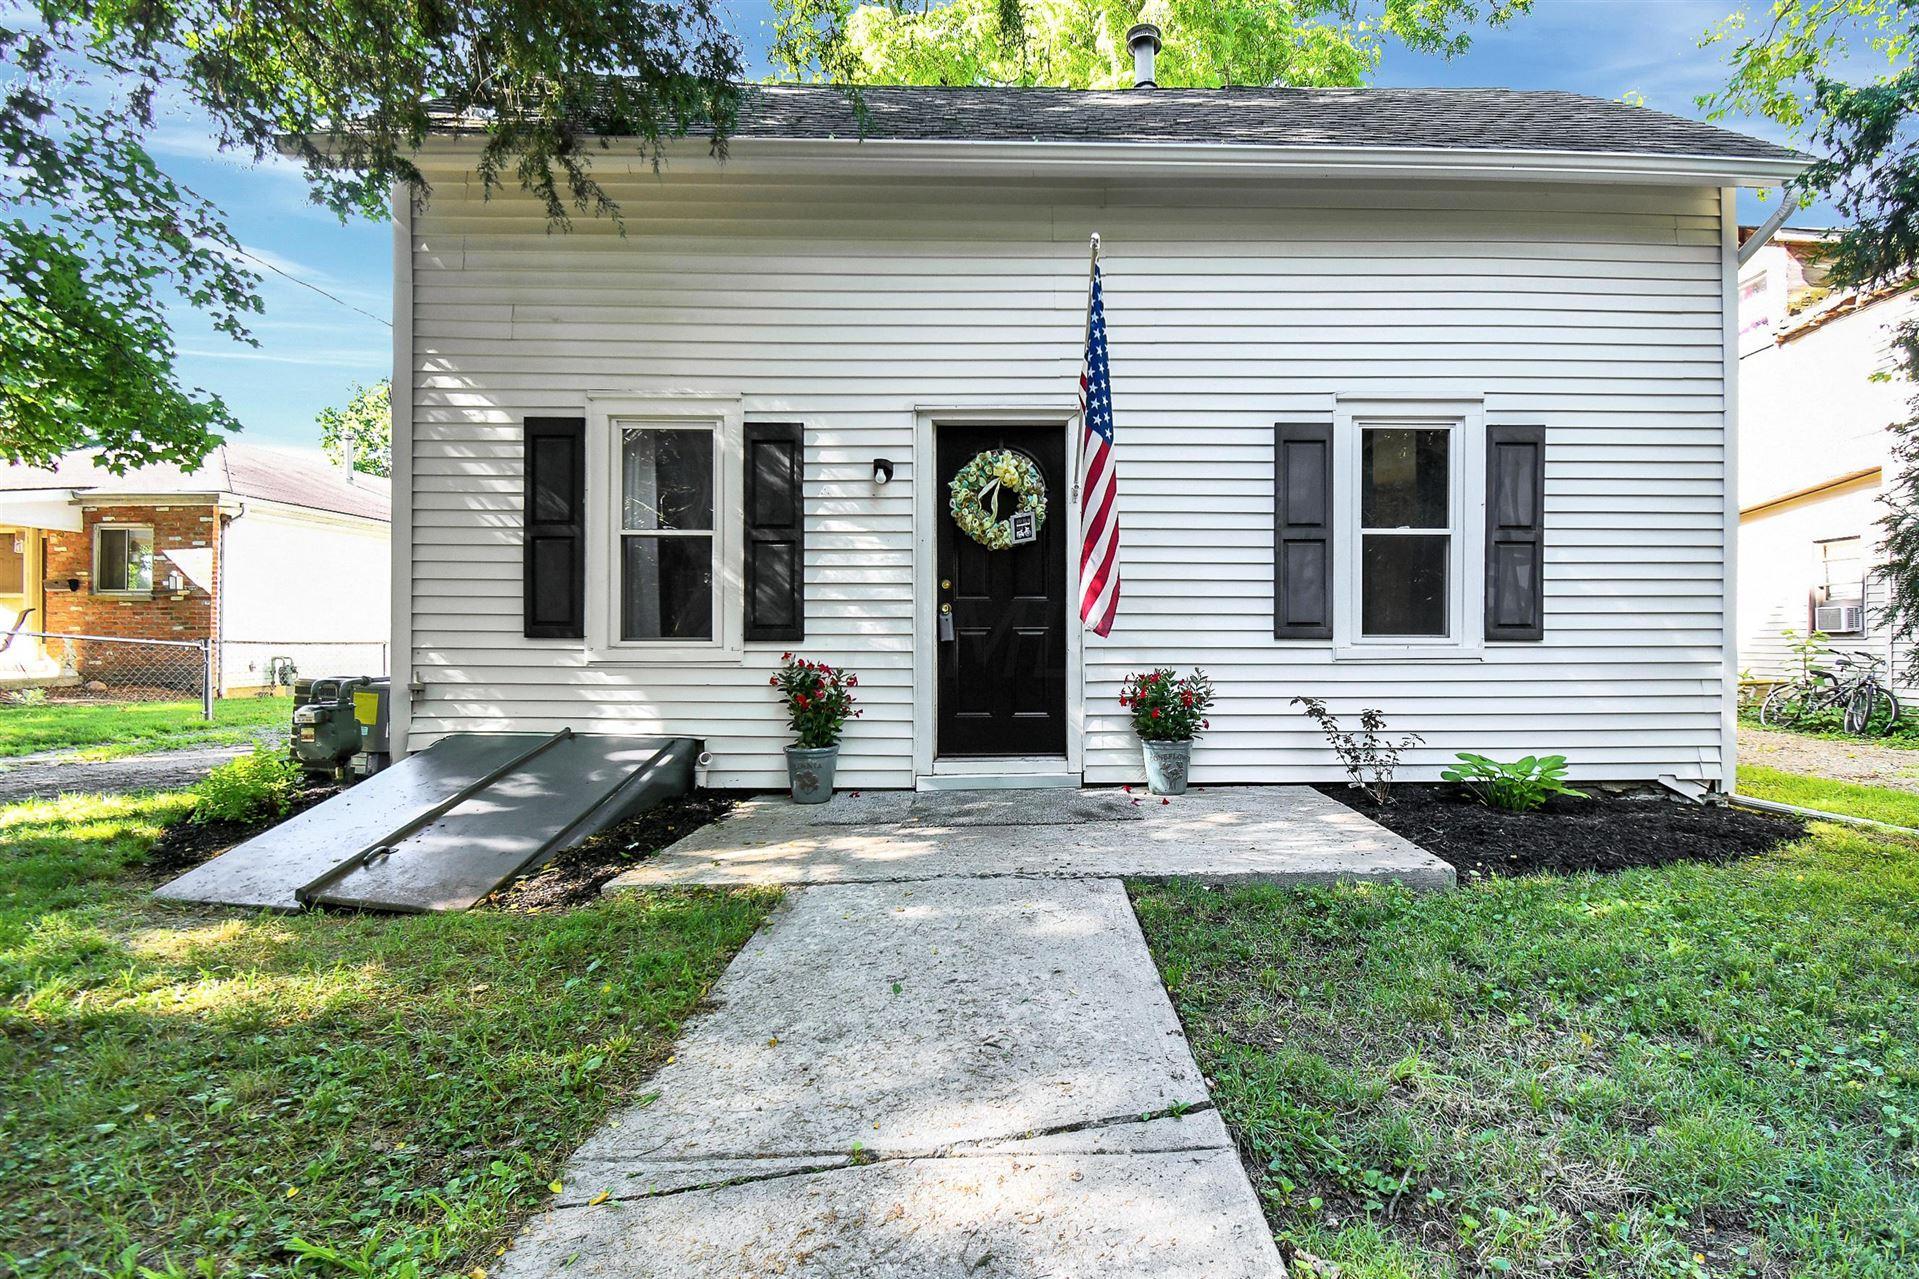 Photo of 30 Branch Street, Delaware, OH 43015 (MLS # 221021545)